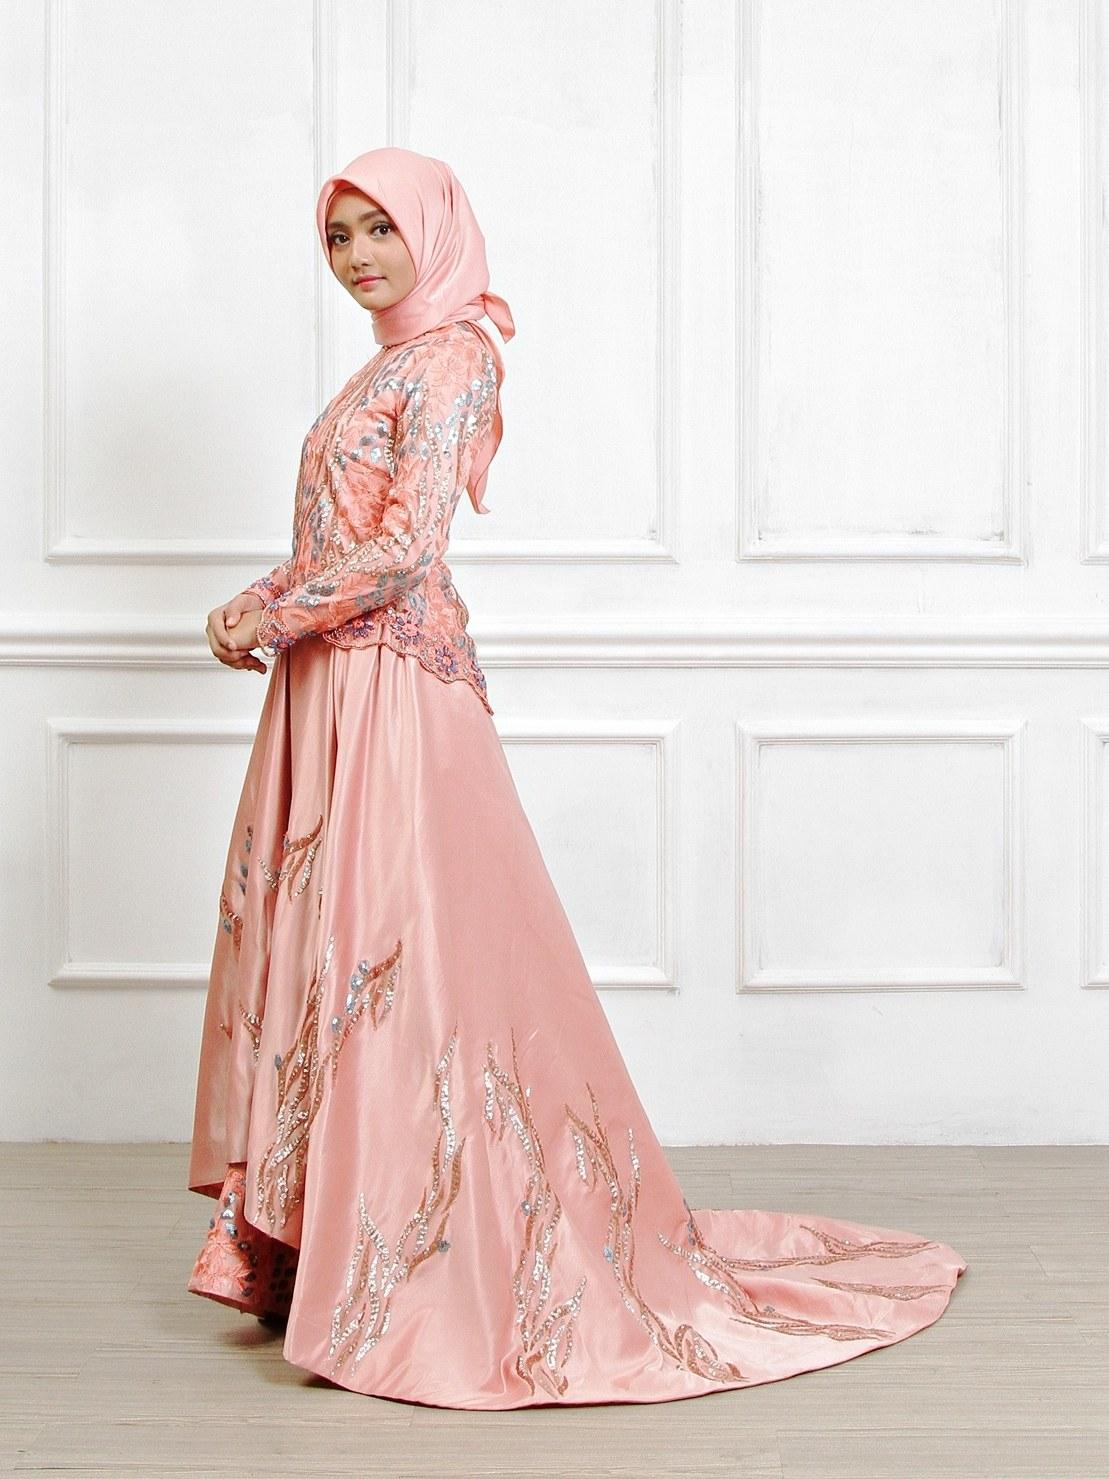 Design Sewa Baju Pengantin Muslimah Murah Tqd3 Sewa Perdana Baju Pengantin Muslimah Jogja Gaun Pengantin